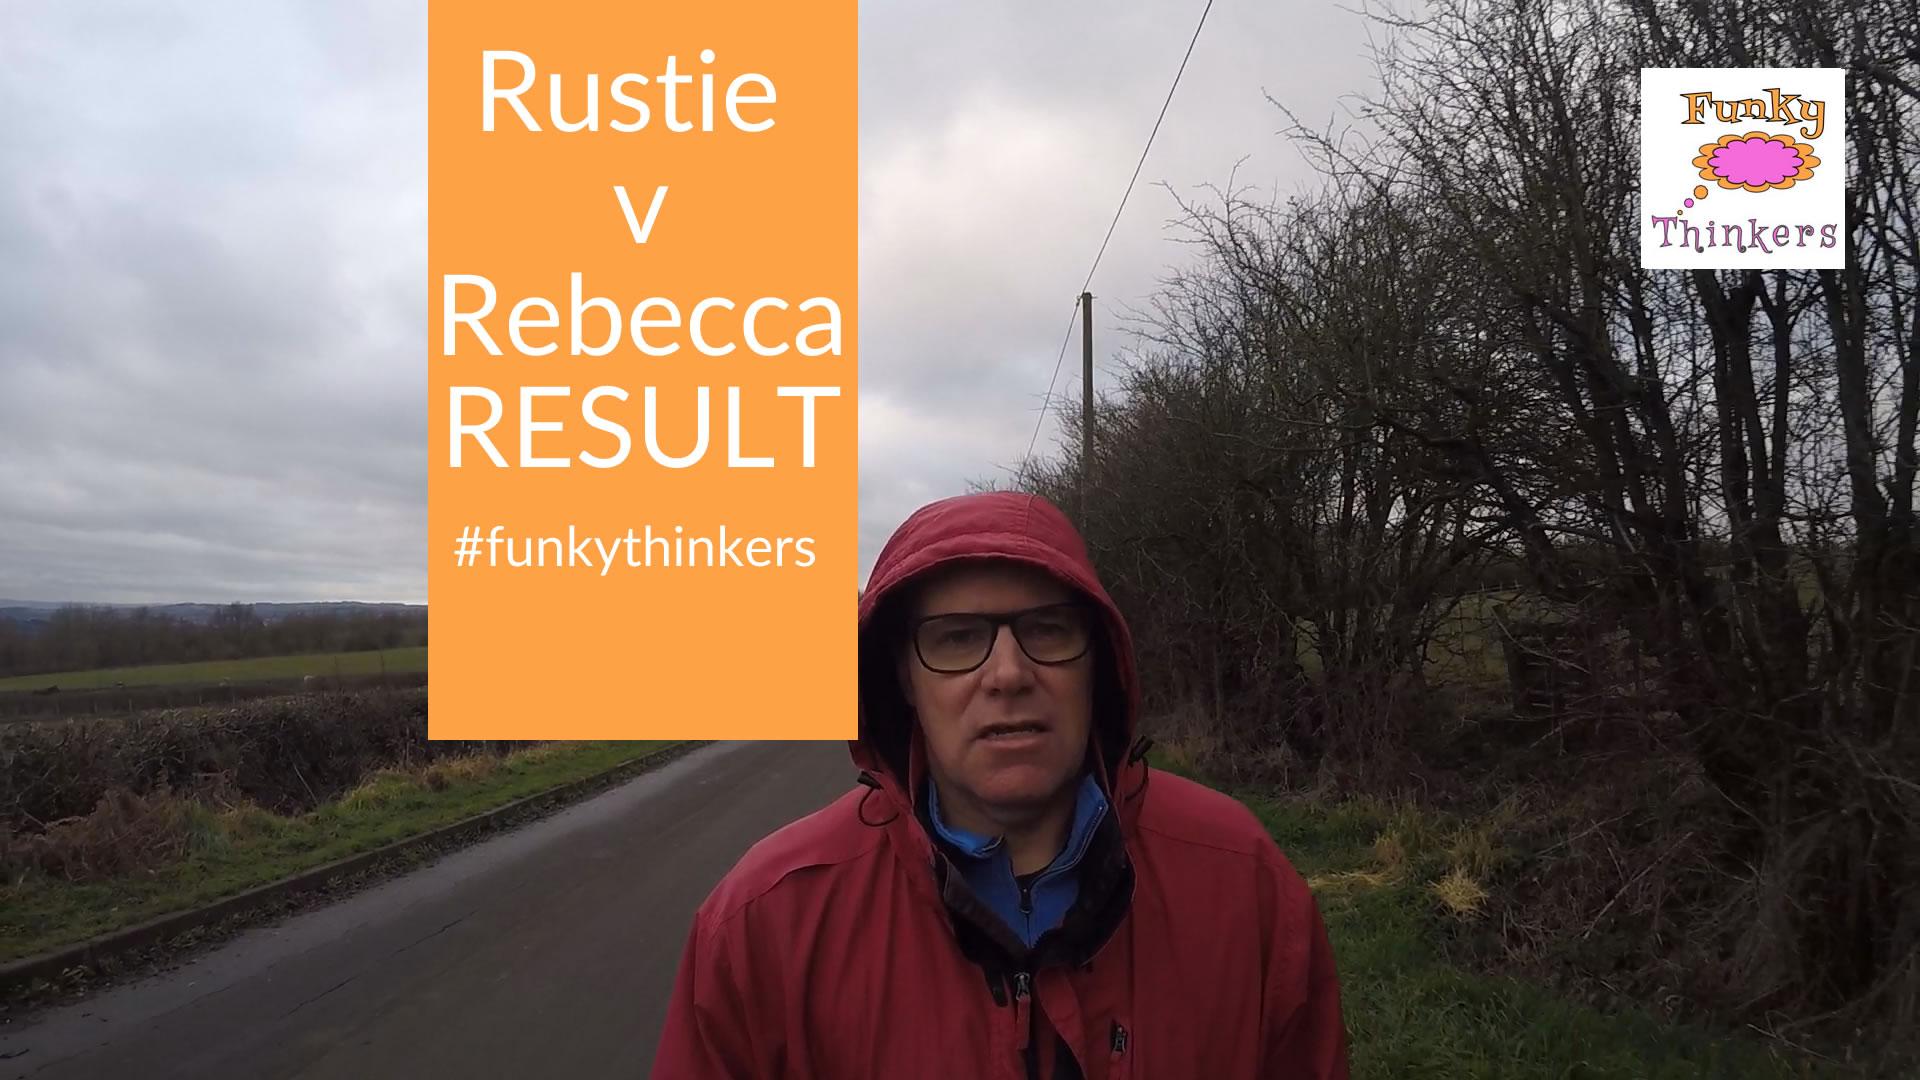 Rustie v Rebecca result